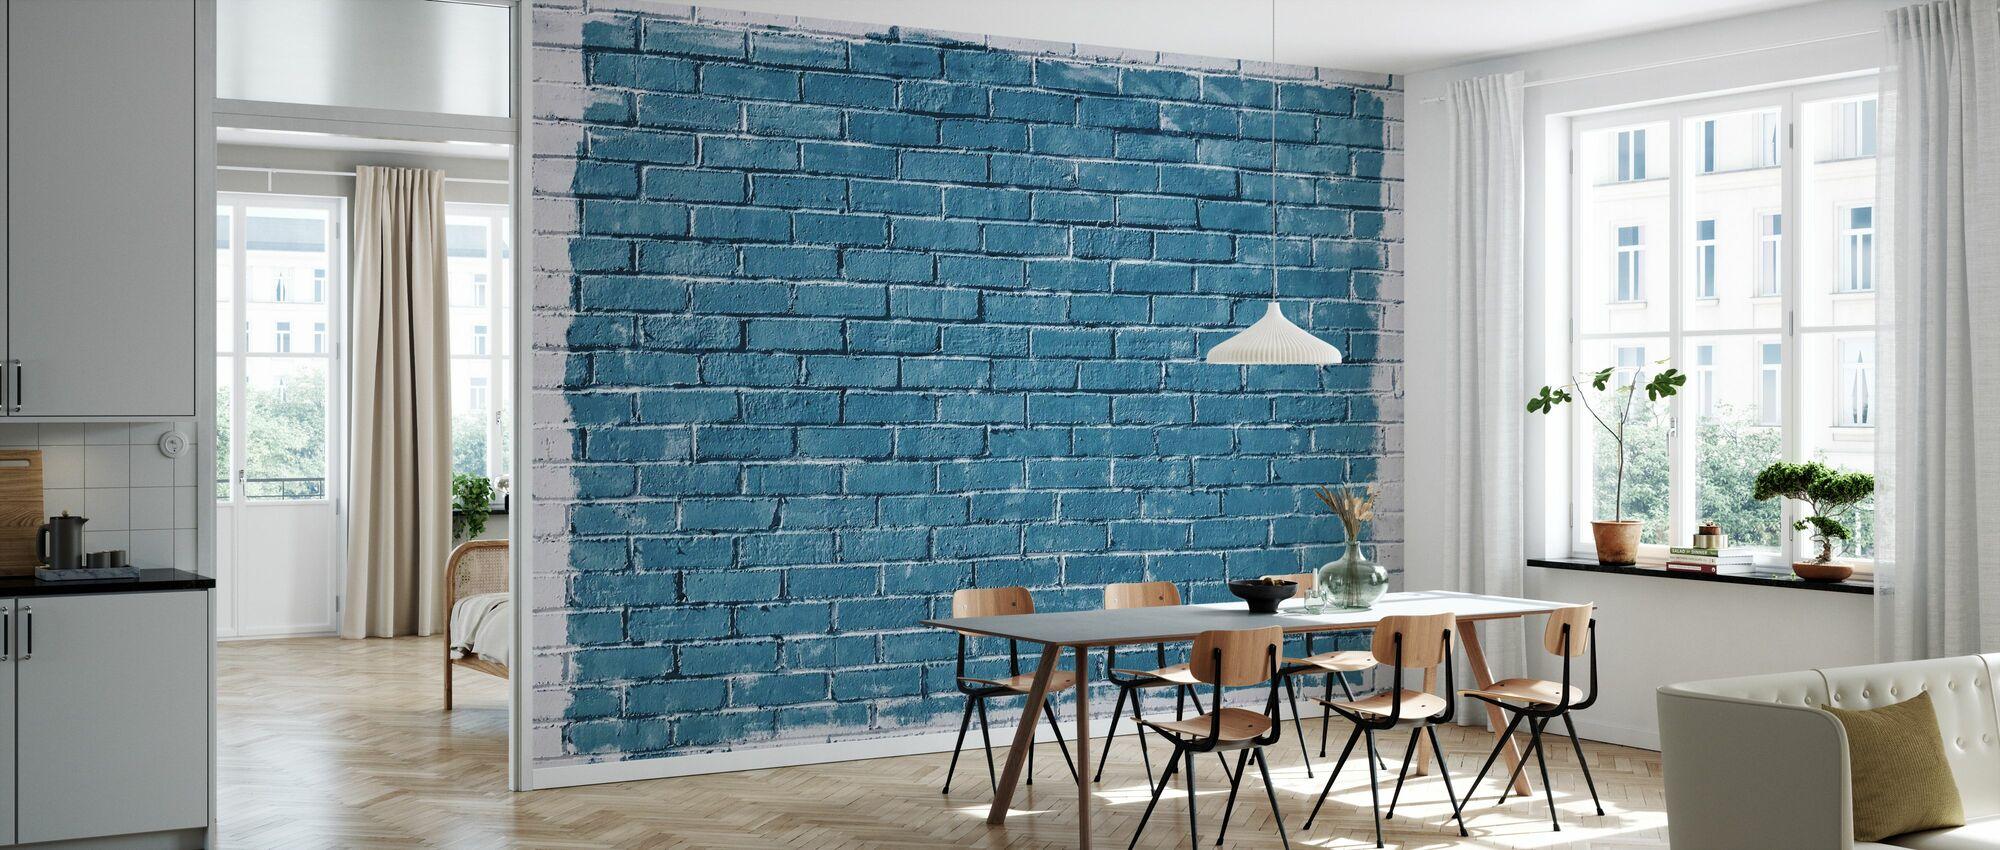 White and Blue Brick Wall - Wallpaper - Kitchen